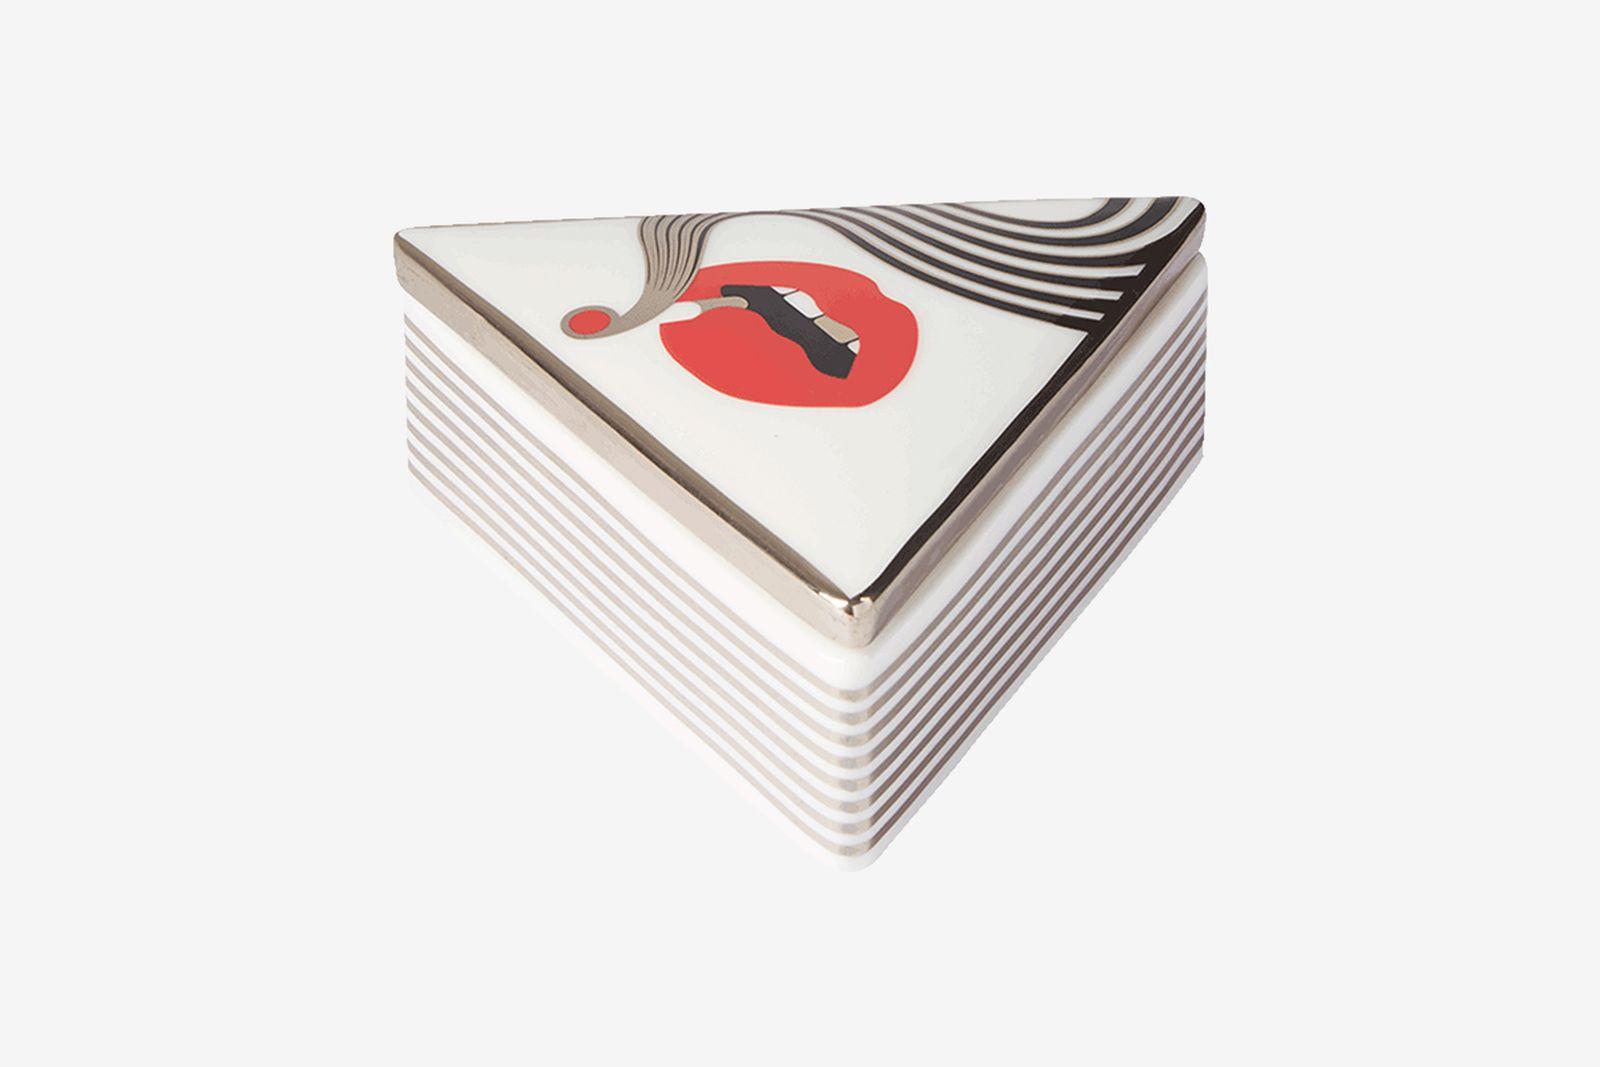 jonathan-adler-triangle-box-02